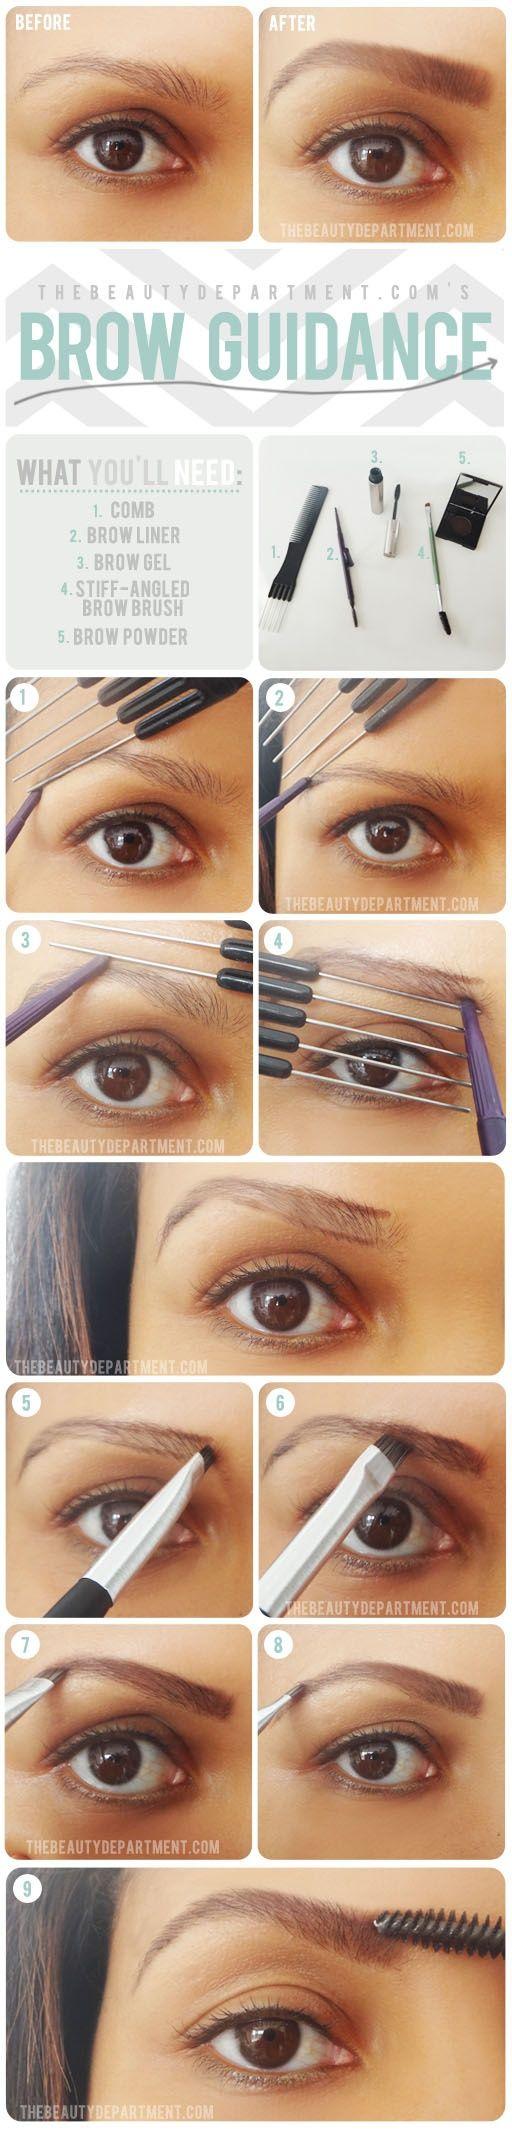 Eye Brow Guidance